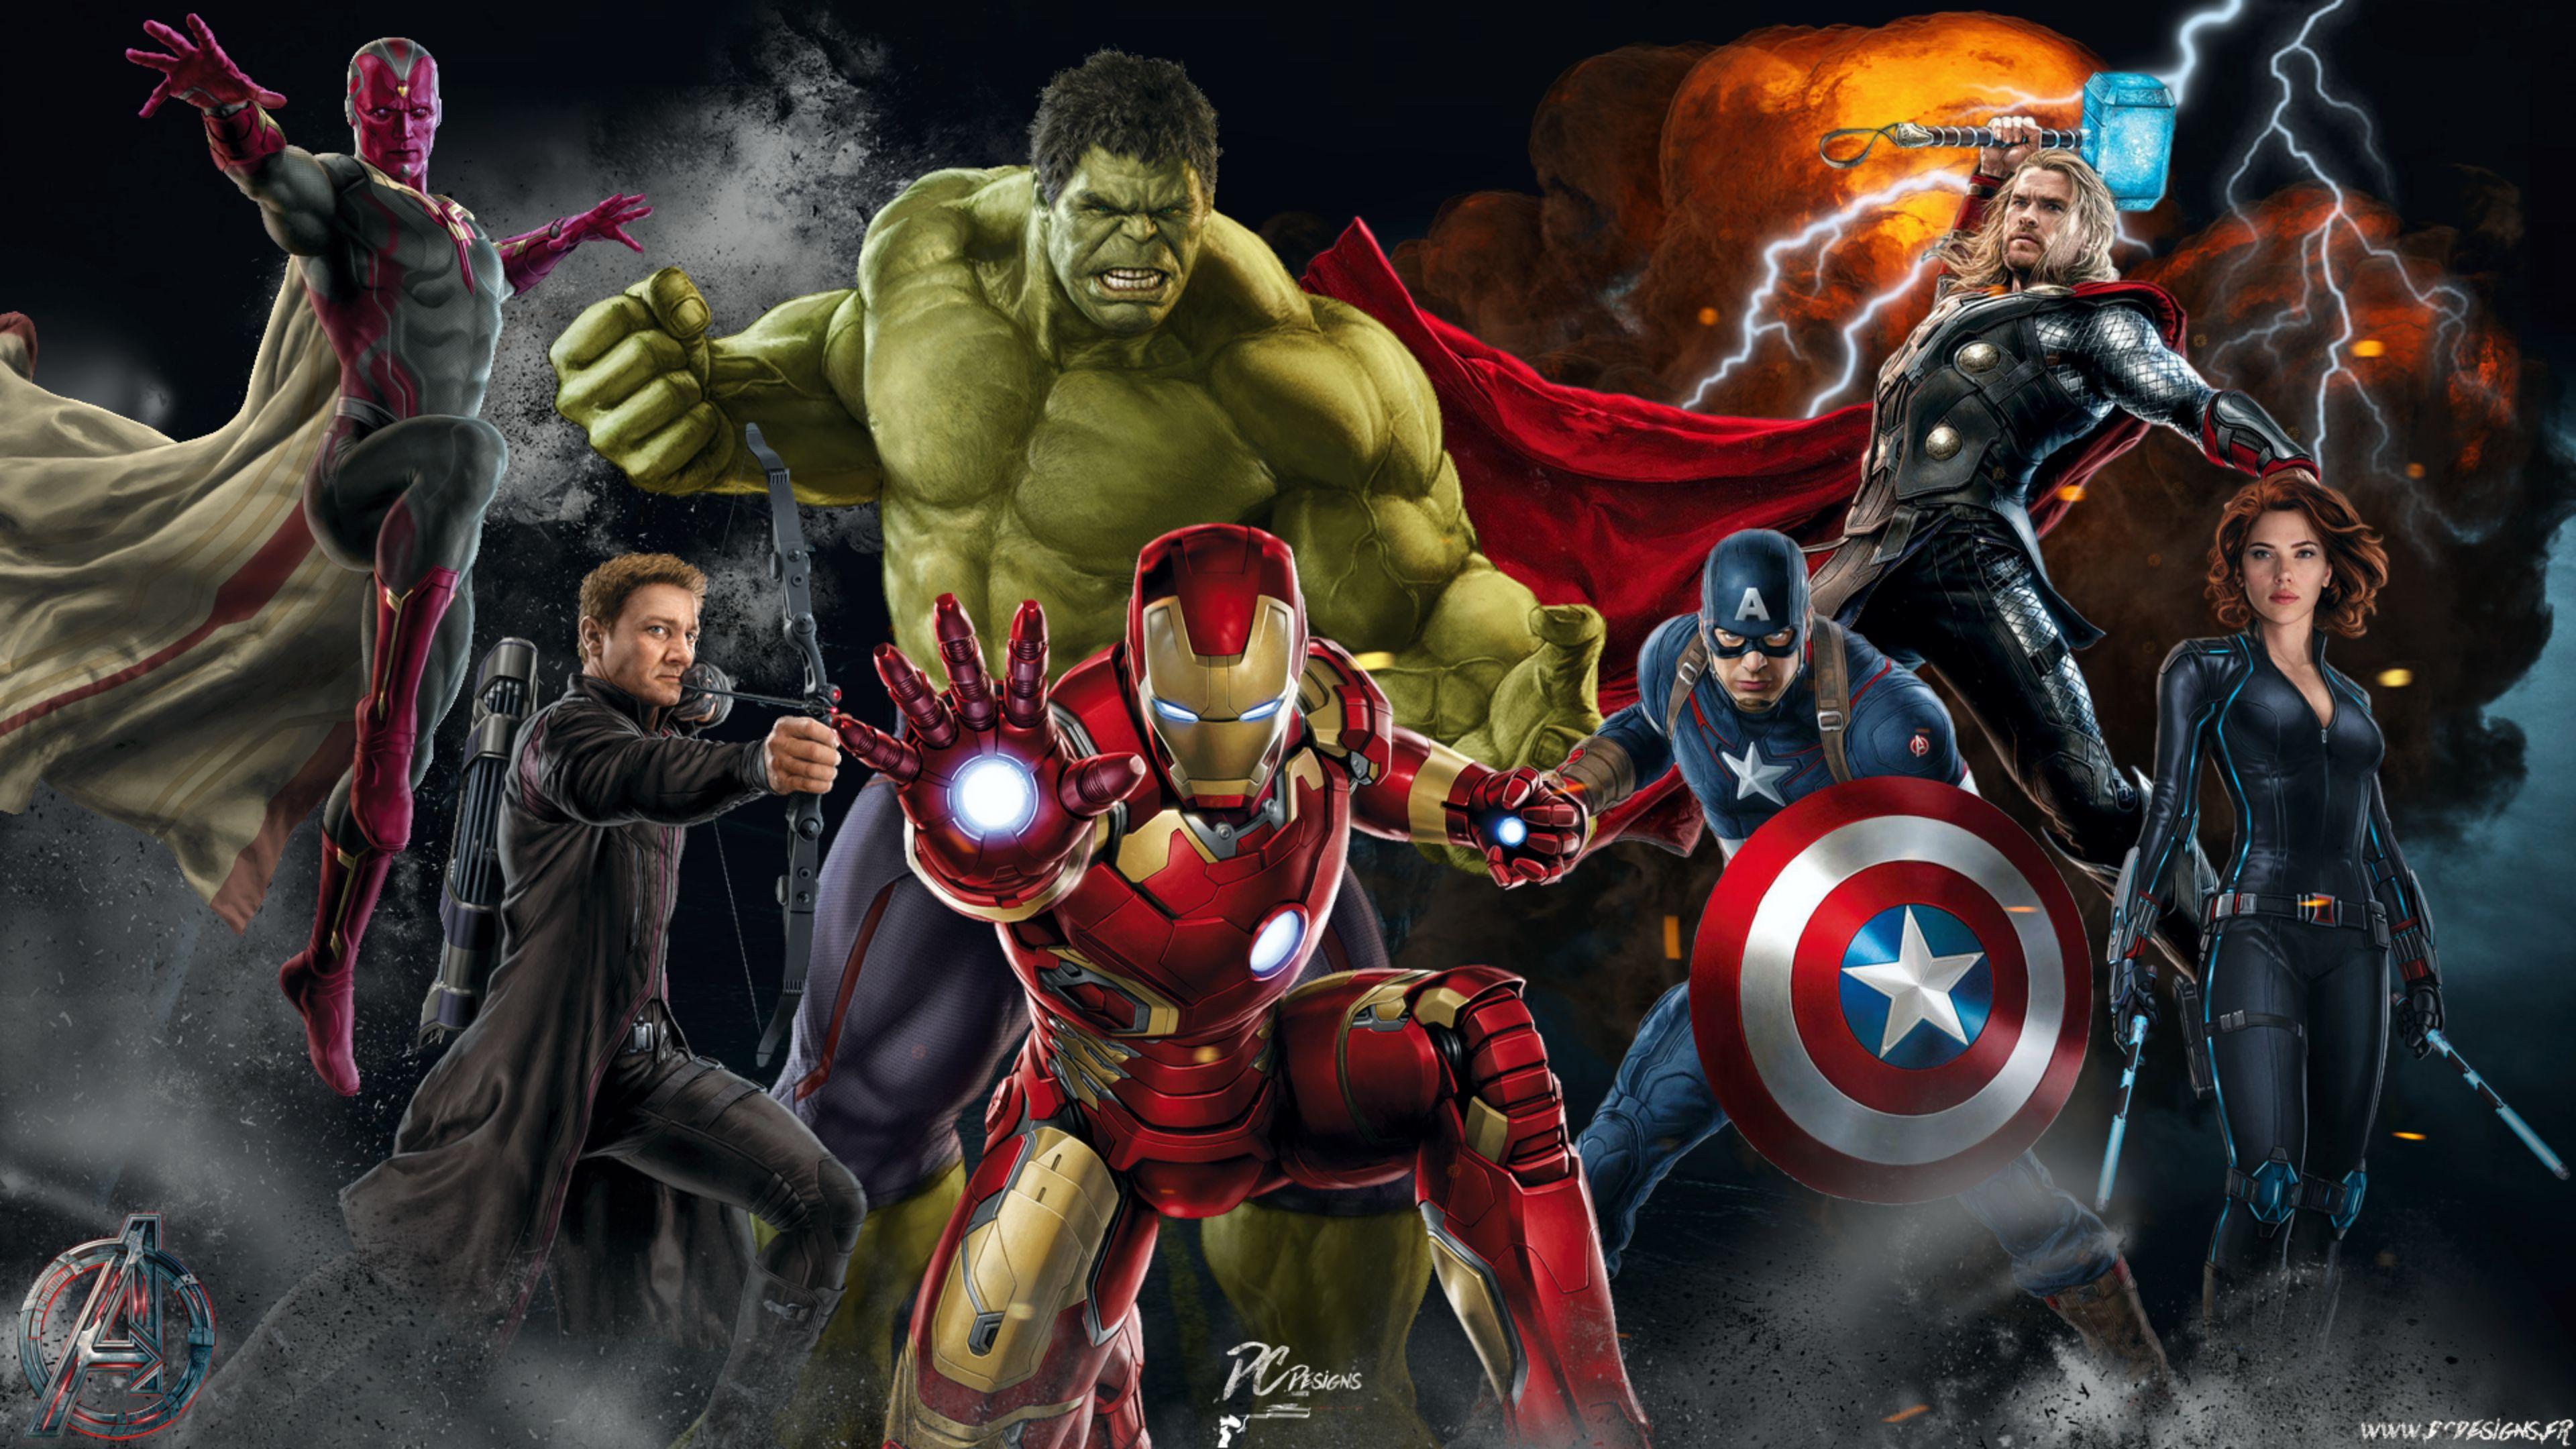 Cars 2 Wallpaper Free Download Hd Avengers Age Of Ultron Tony Stark Iron Man Ultra Hd 4k